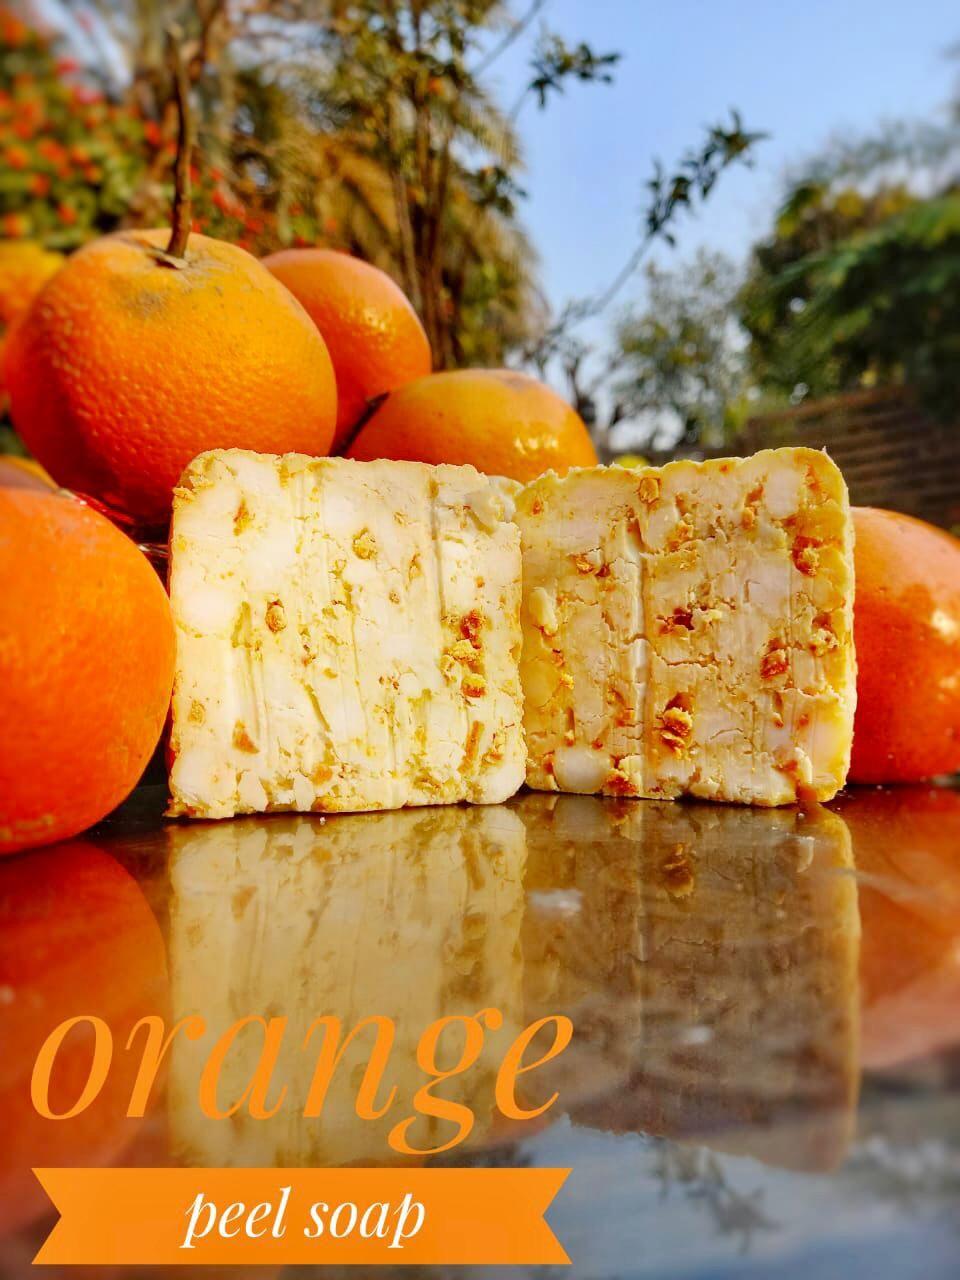 Limited edition Fibre Life's skin whitening Orange soap seasonal 100% organic bath and beauty soap